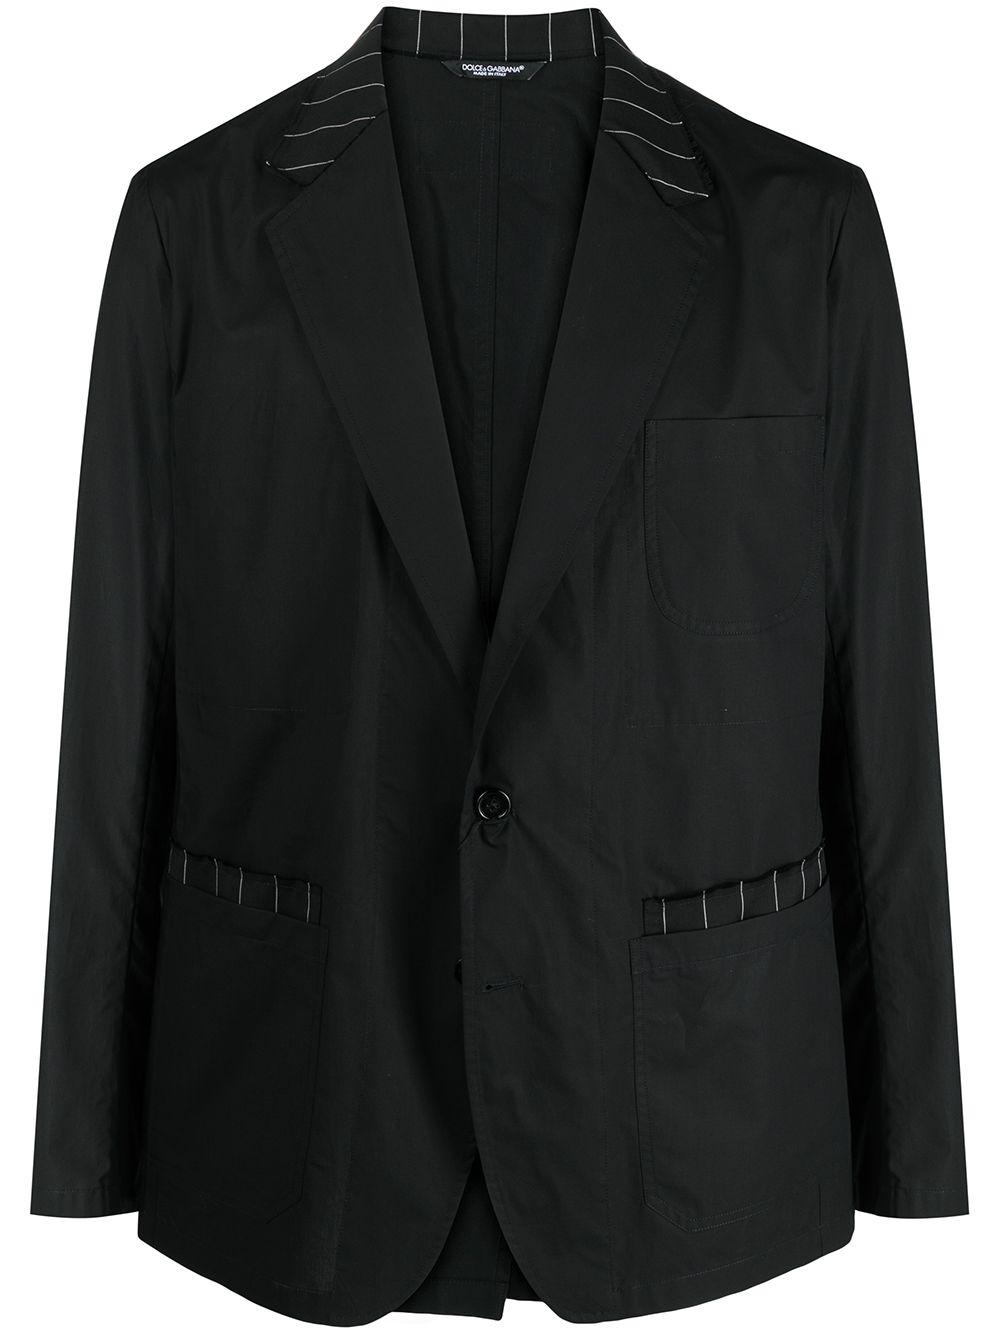 Black cotton virgin wool blend pinstriped details single-breasted blazer  DOLCE & GABBANA |  | G2LW5T-GER01N0000